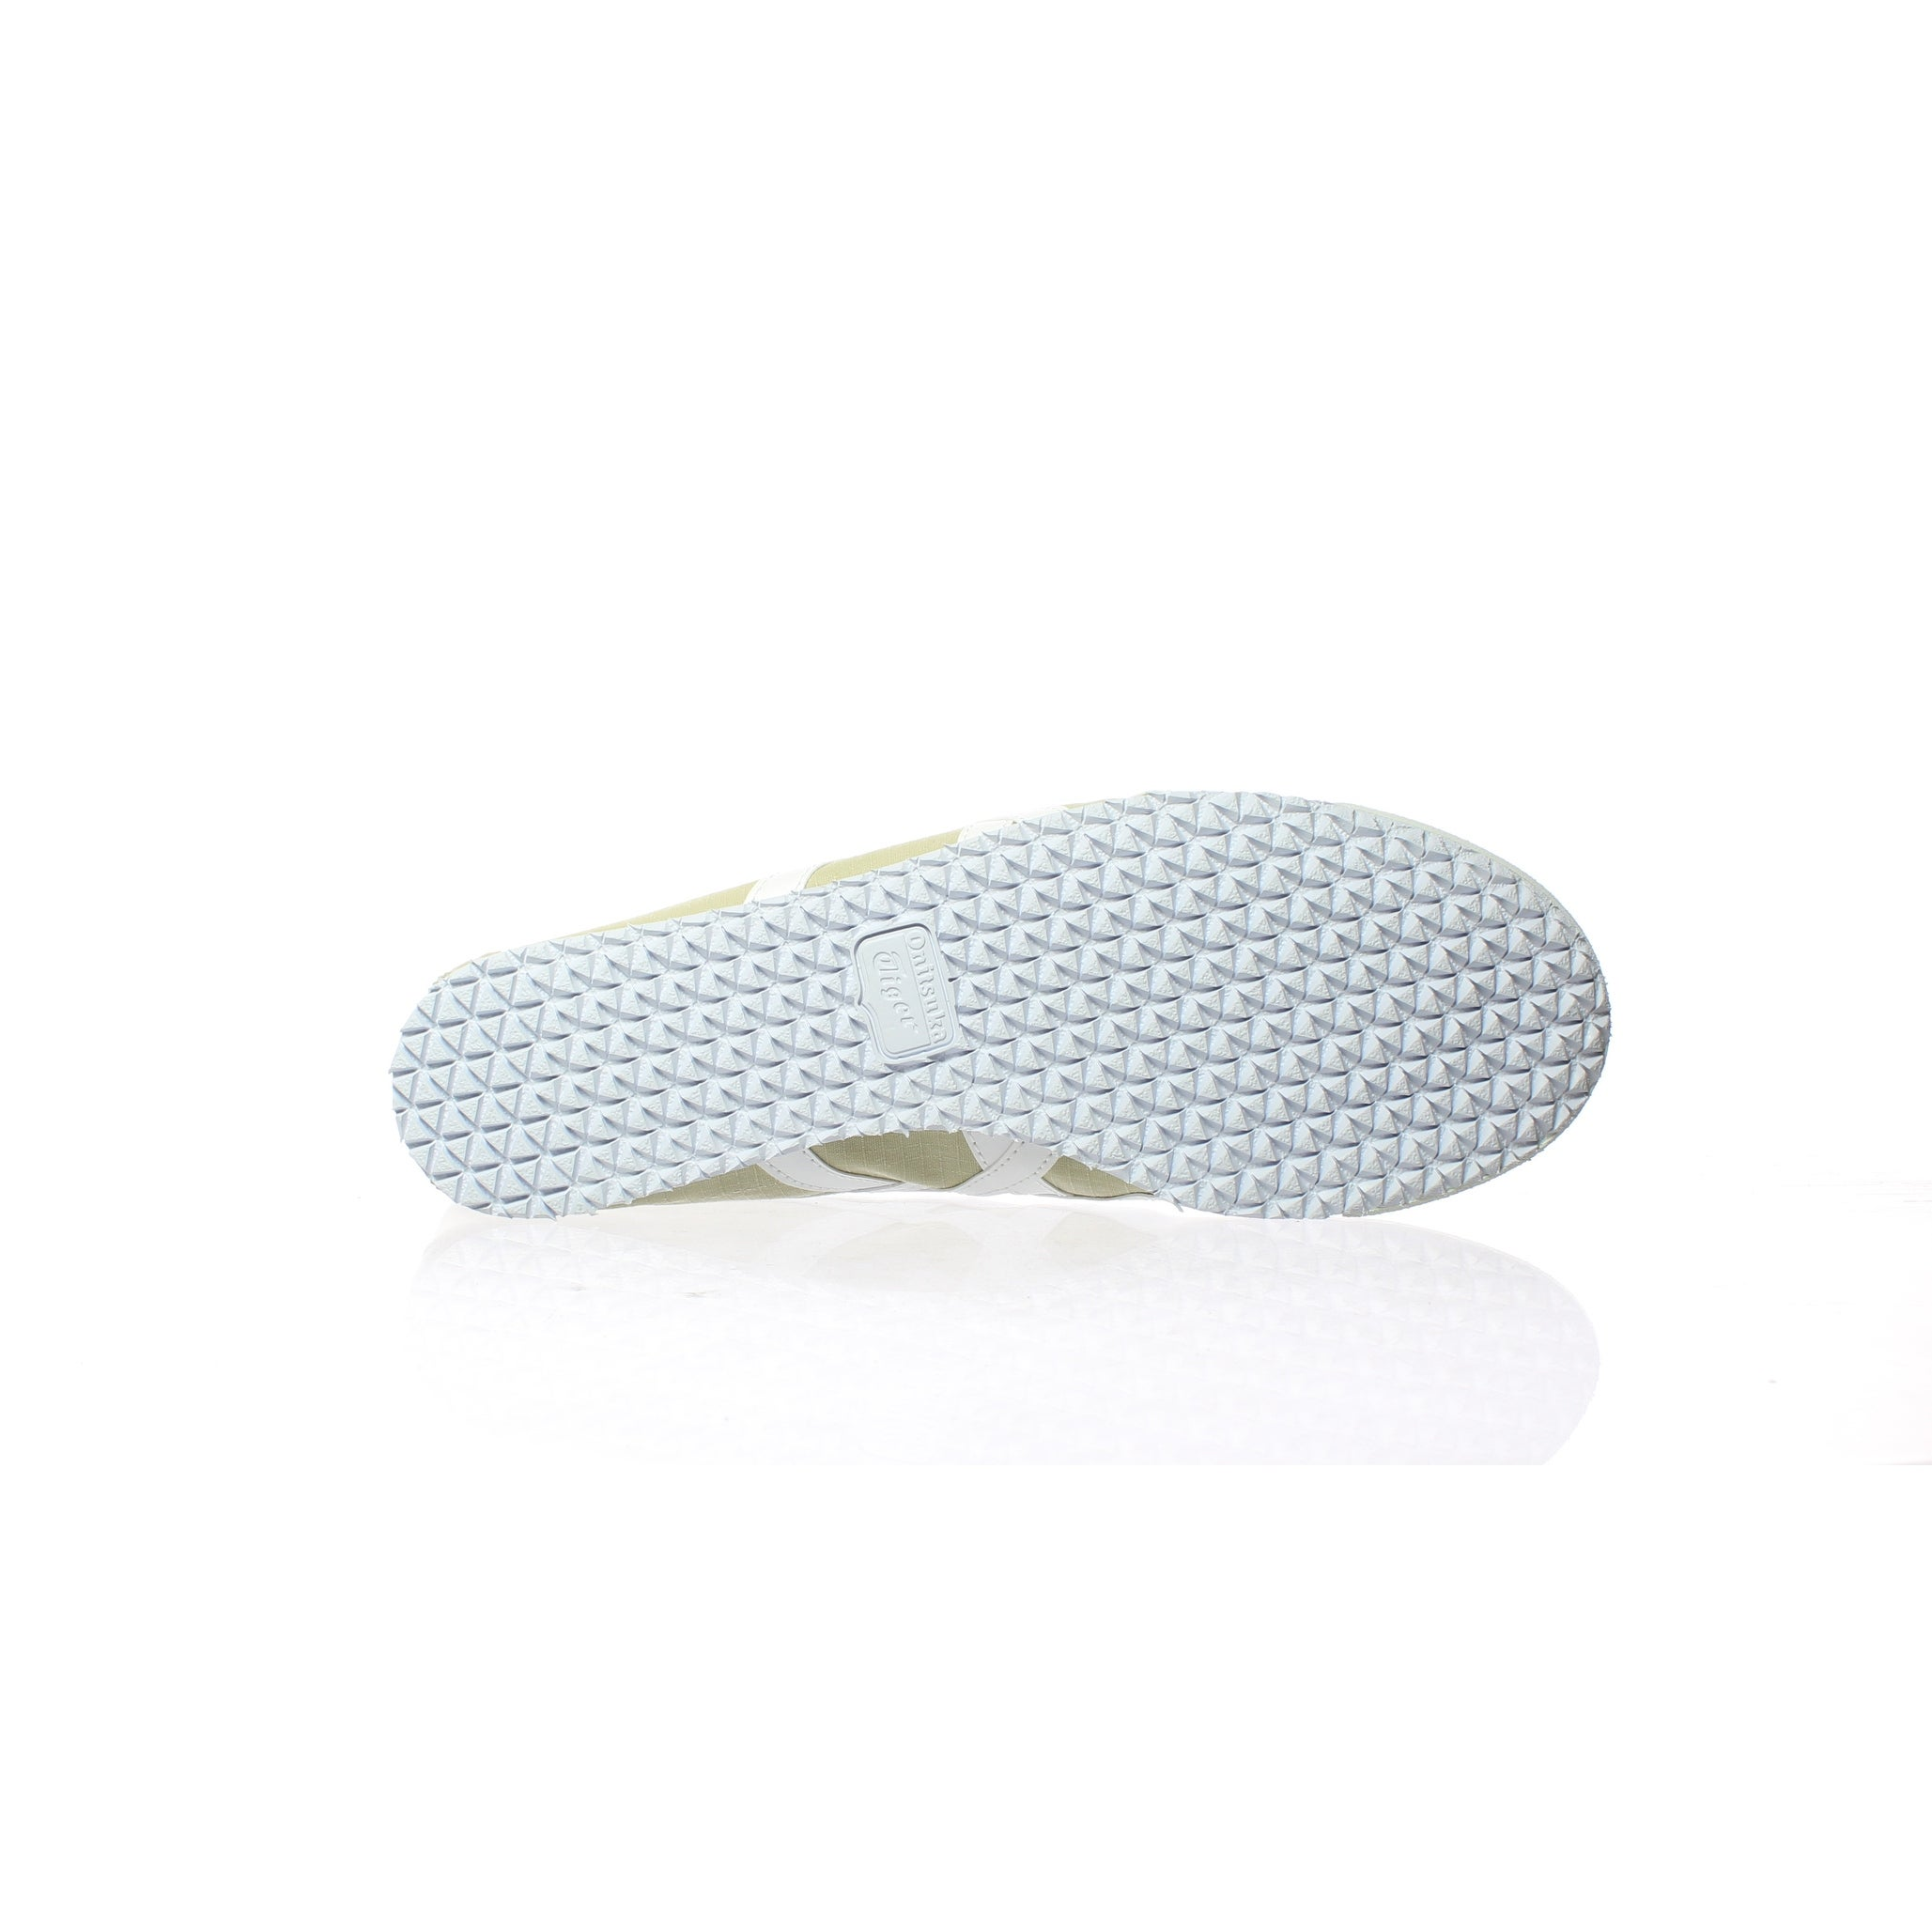 new styles 62461 43d42 Onitsuka Tiger Mens Mexico 66 Tan Fashion Sneaker Size 8